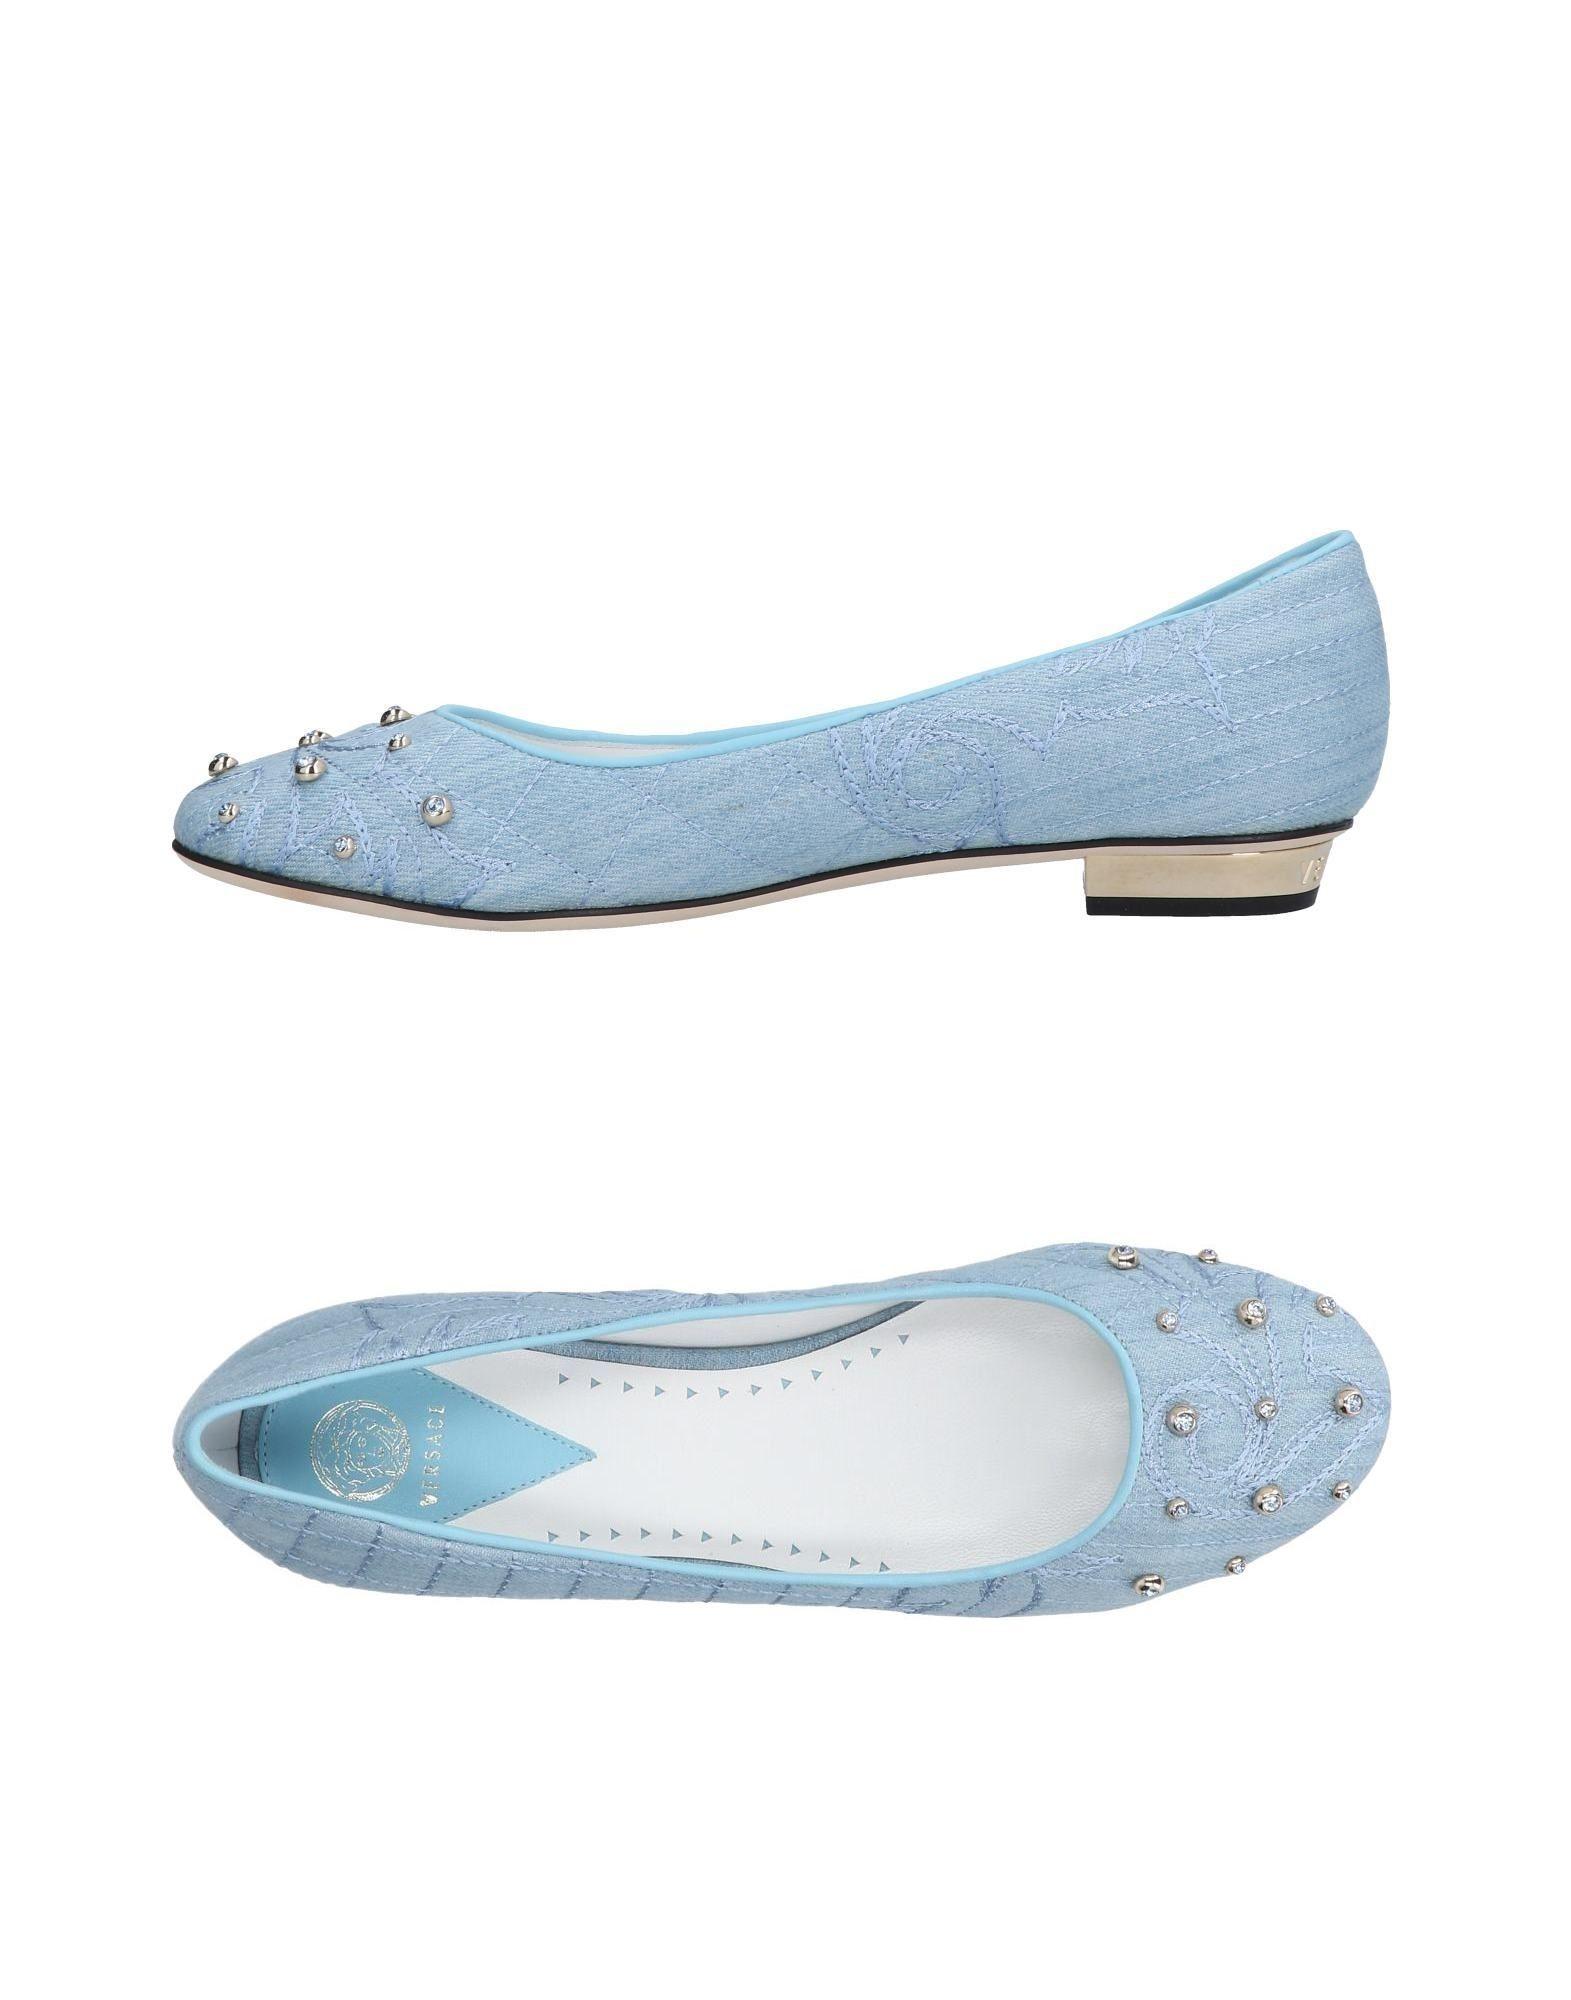 Rabatt Schuhe Versace Ballerinas Damen  11487246DQ